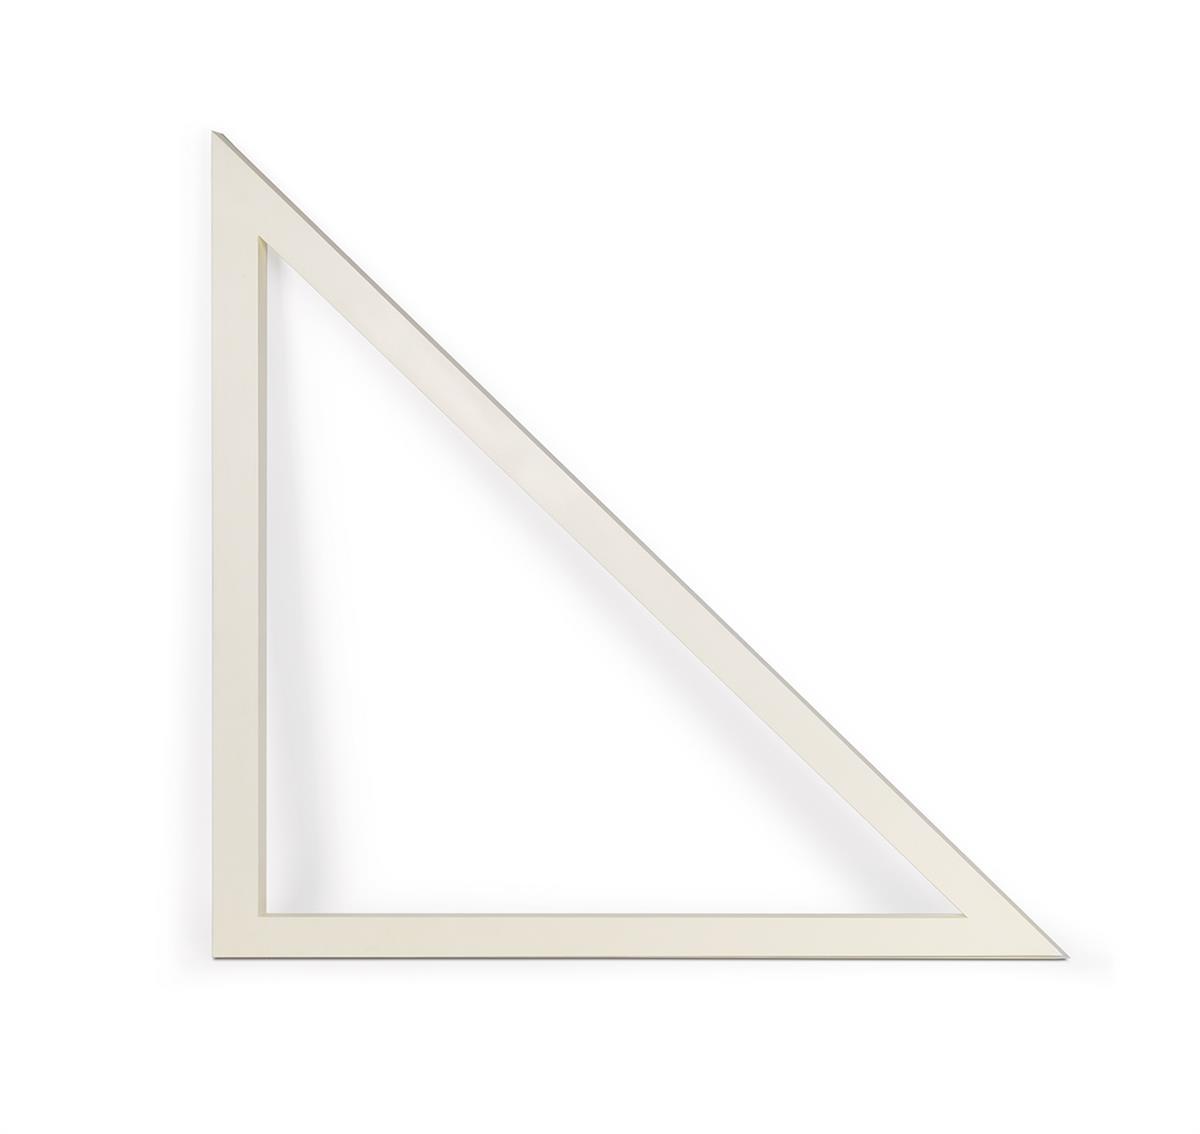 SOL LEWITT Right Triangle.